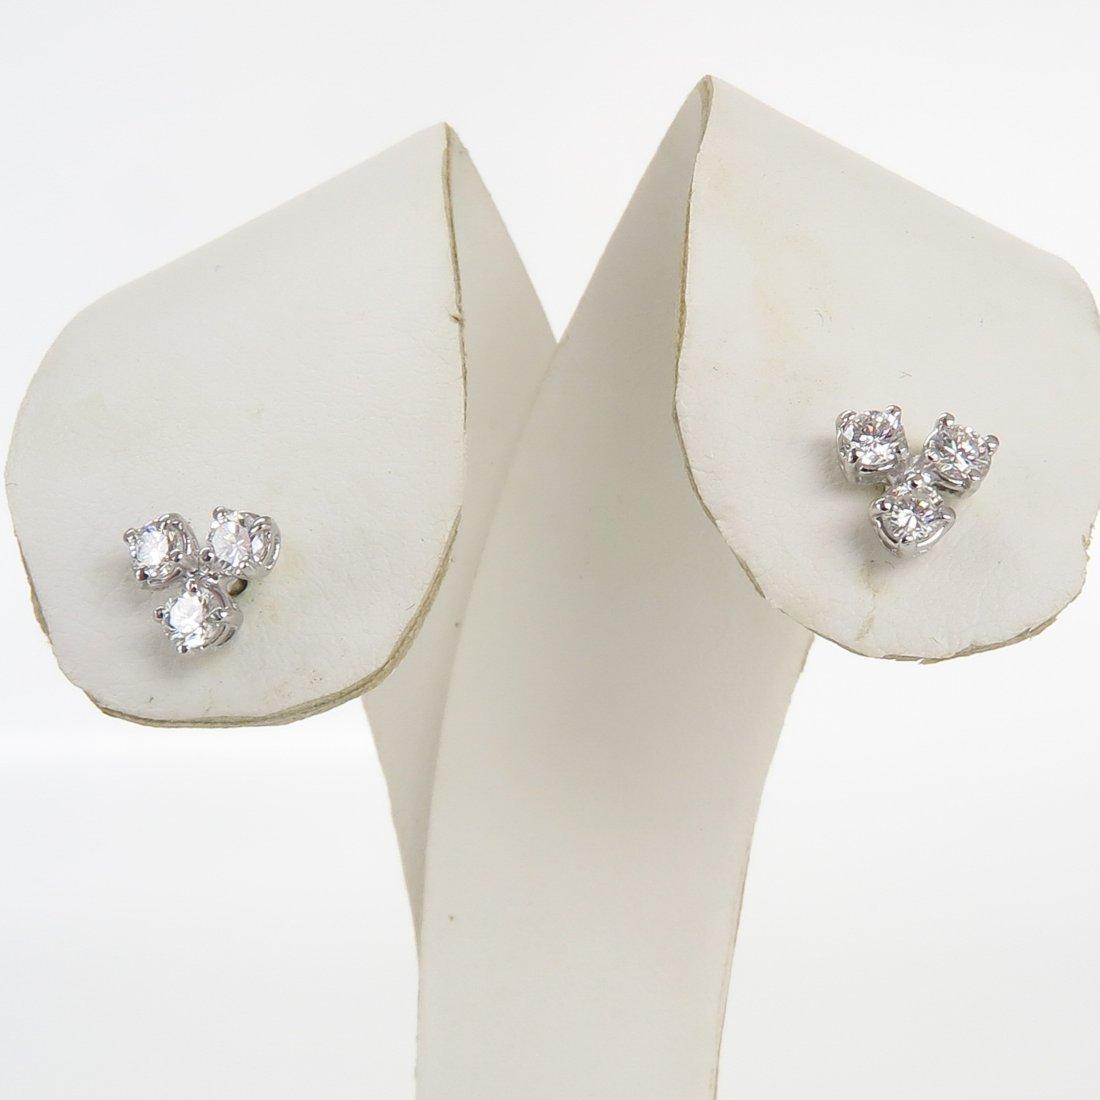 Diamond Earrings of Approximately 0.60 CTW